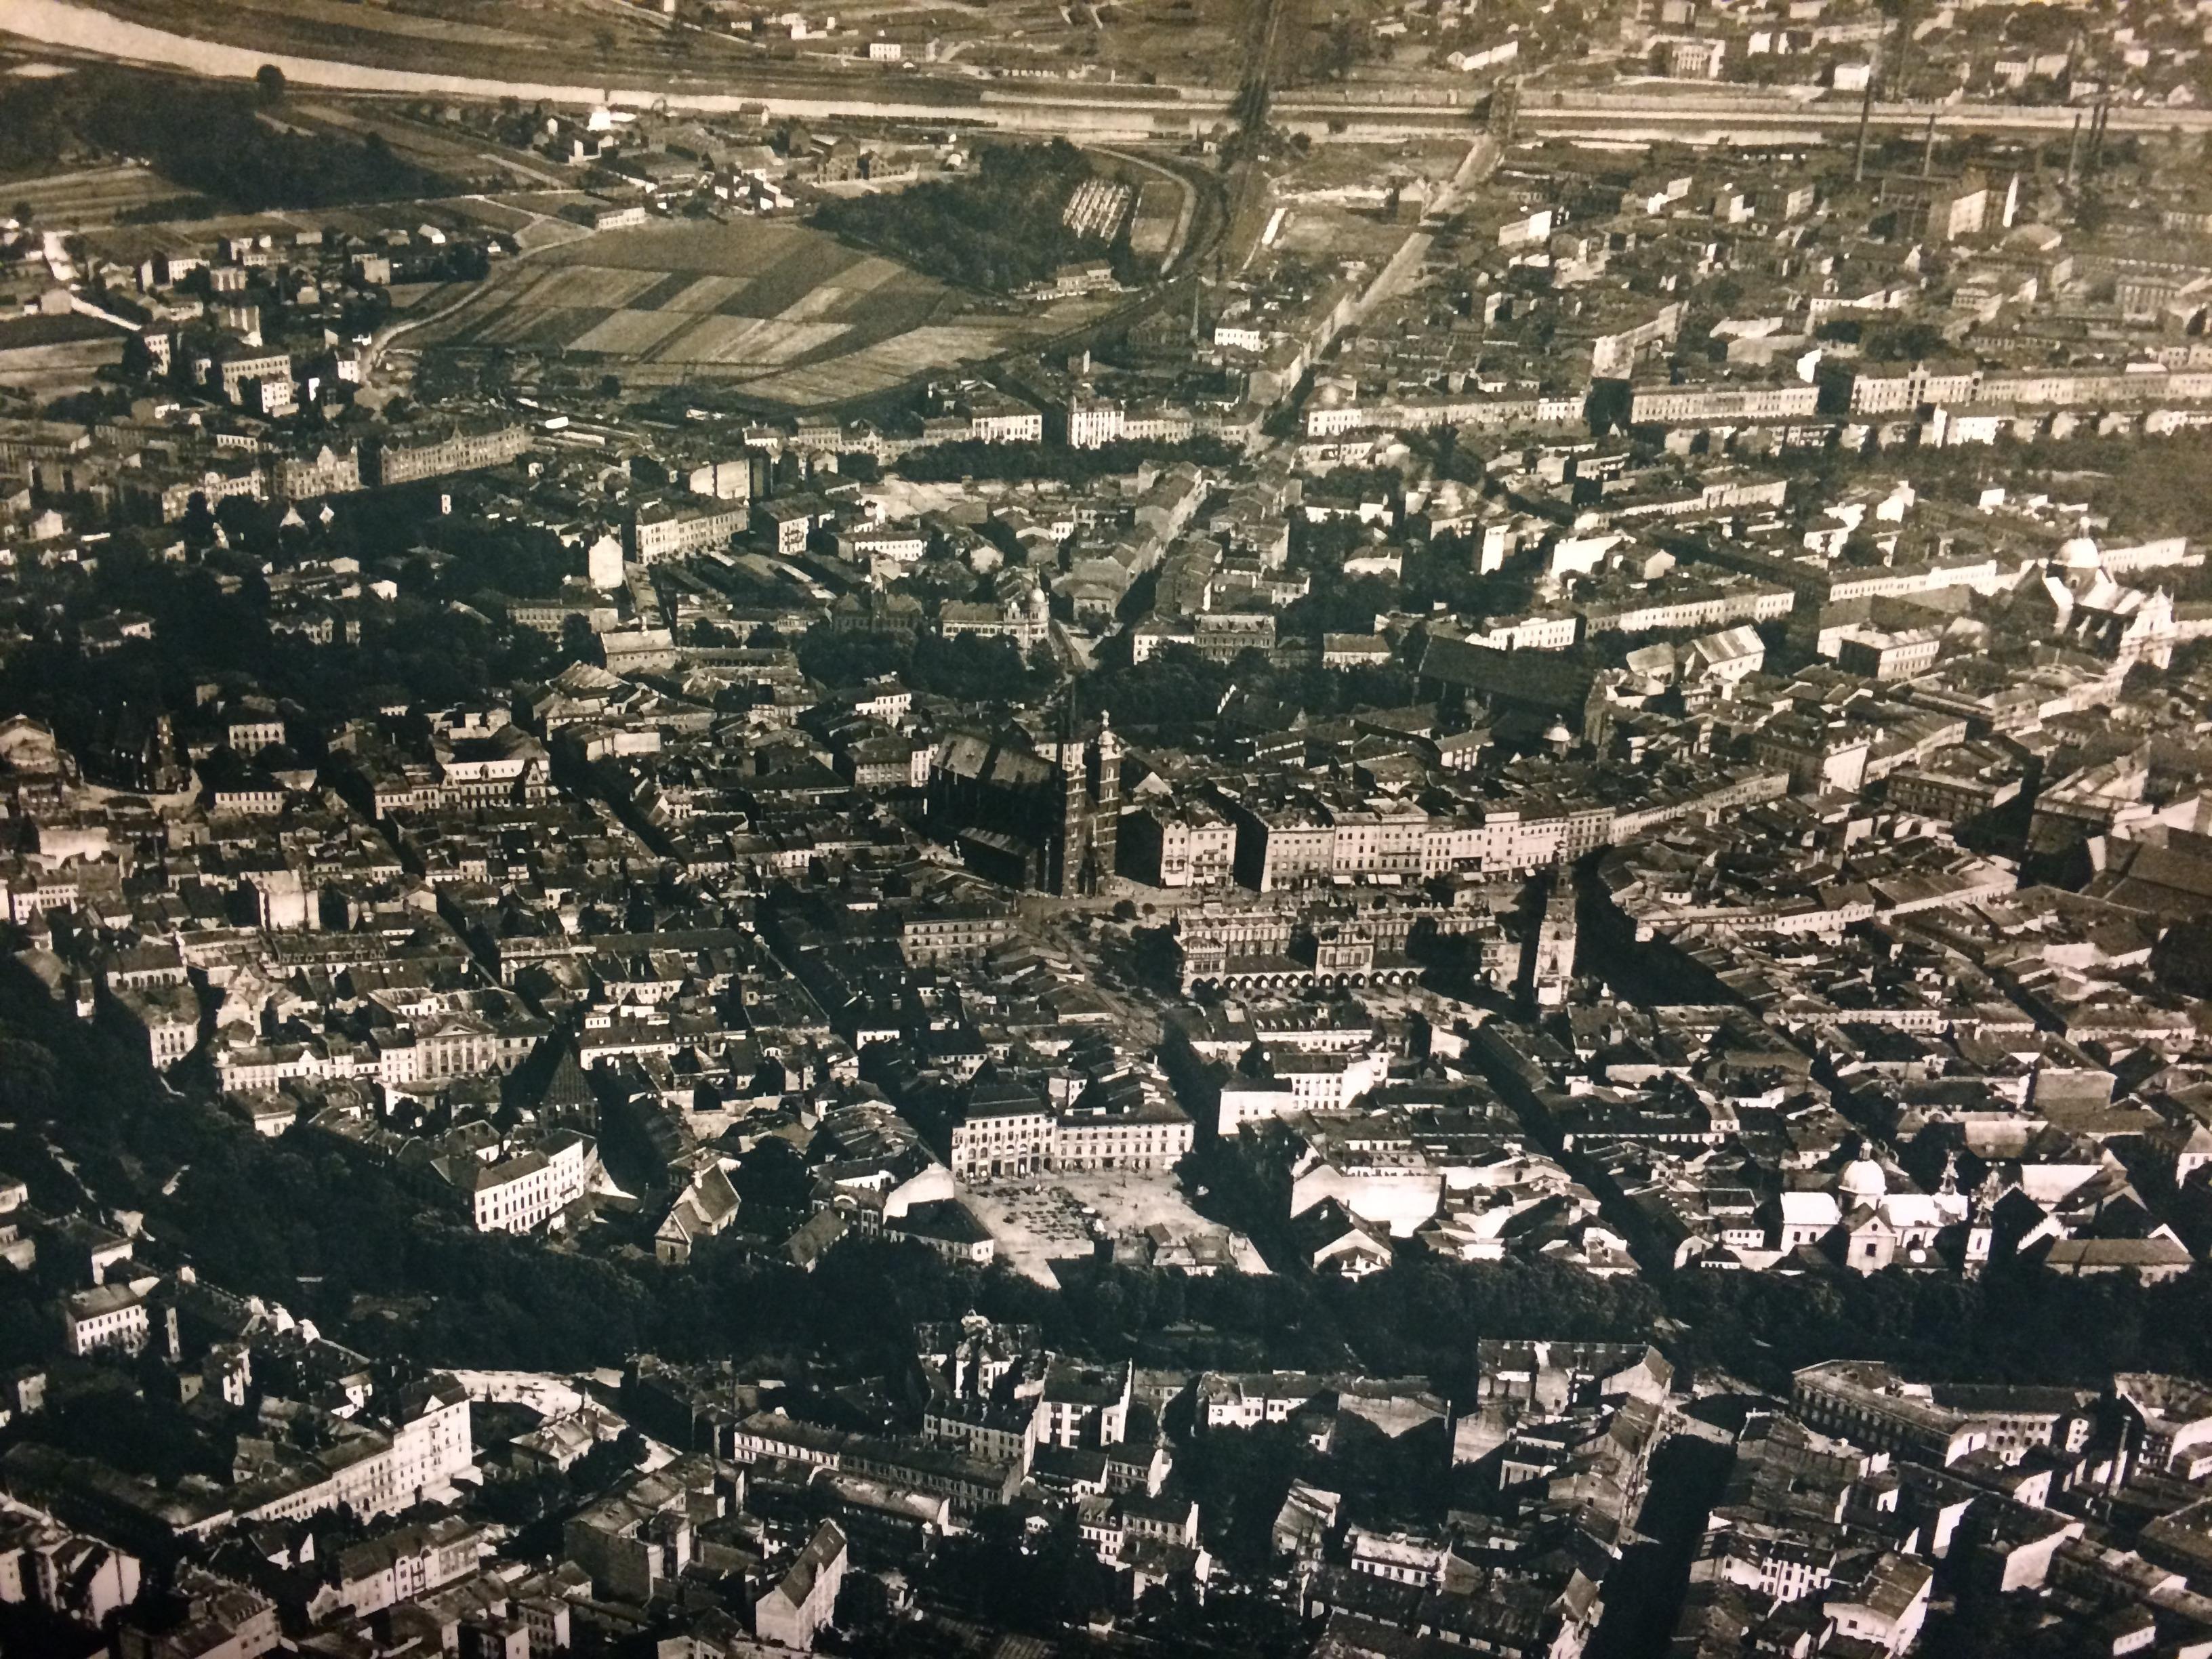 Centro histórico de Cracóvia antes da Segunda Guerra Mundial. (Foto: Nathalia Tavolieri)